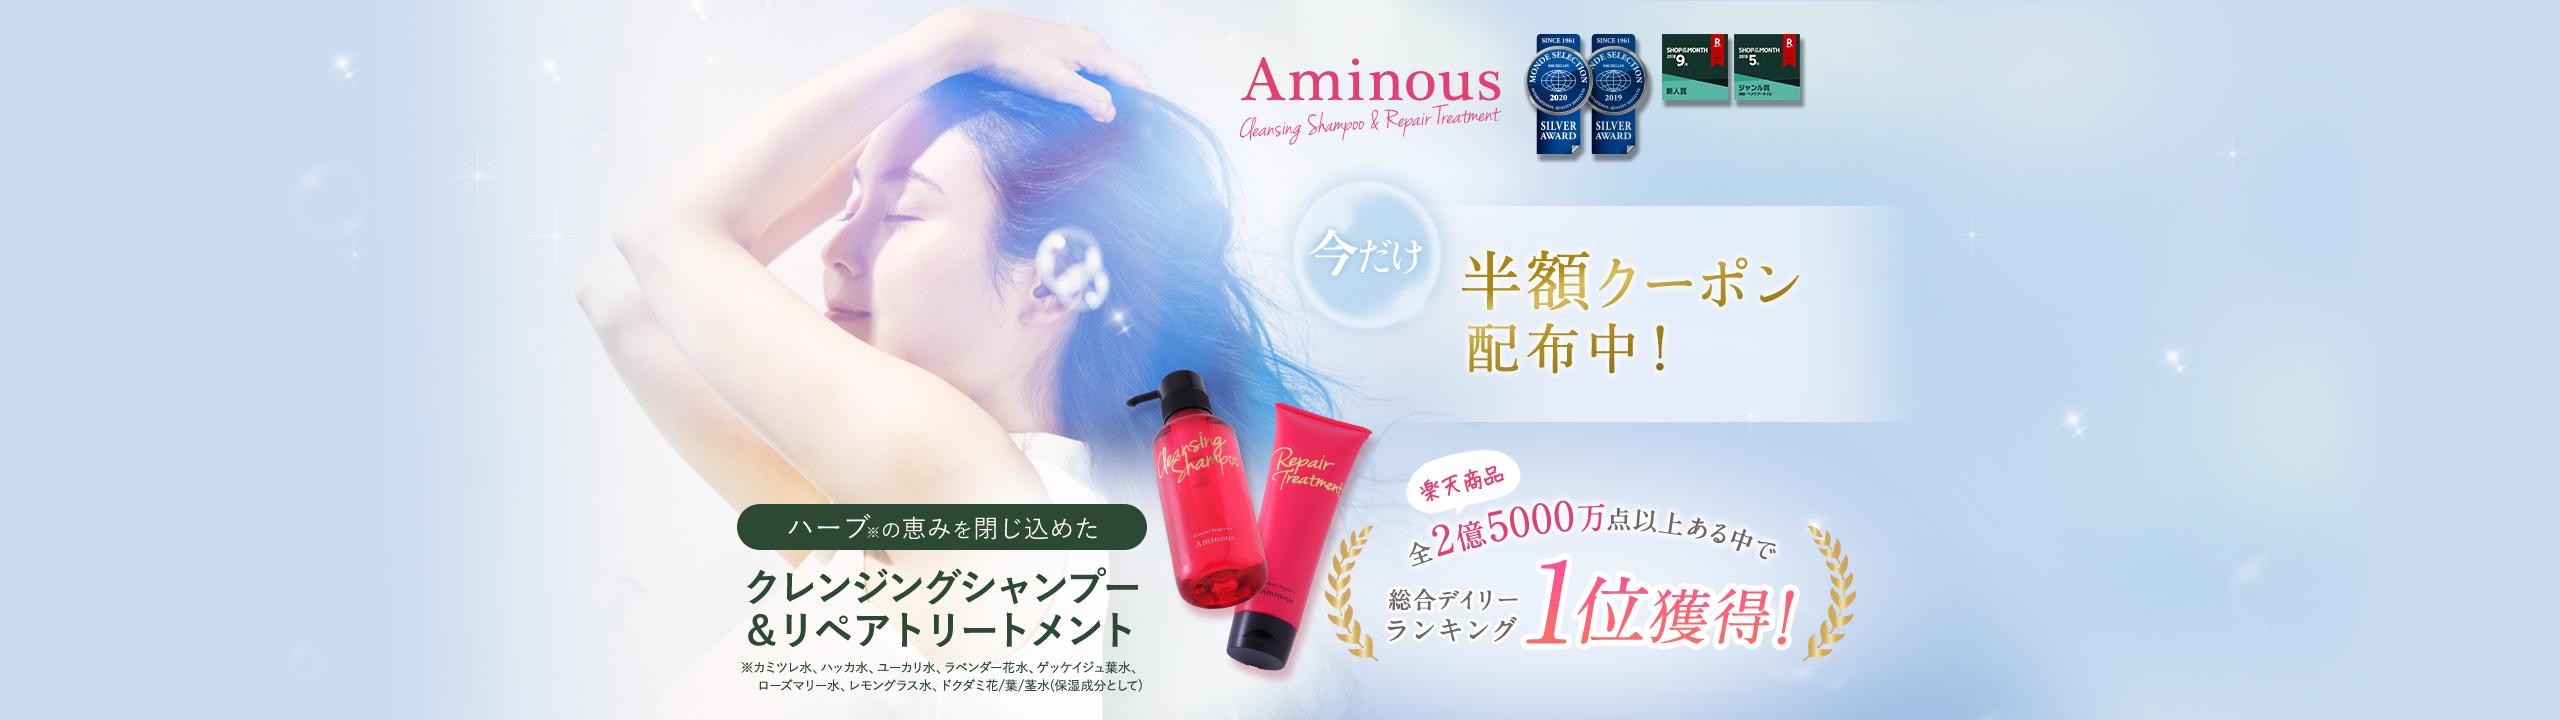 Aminous